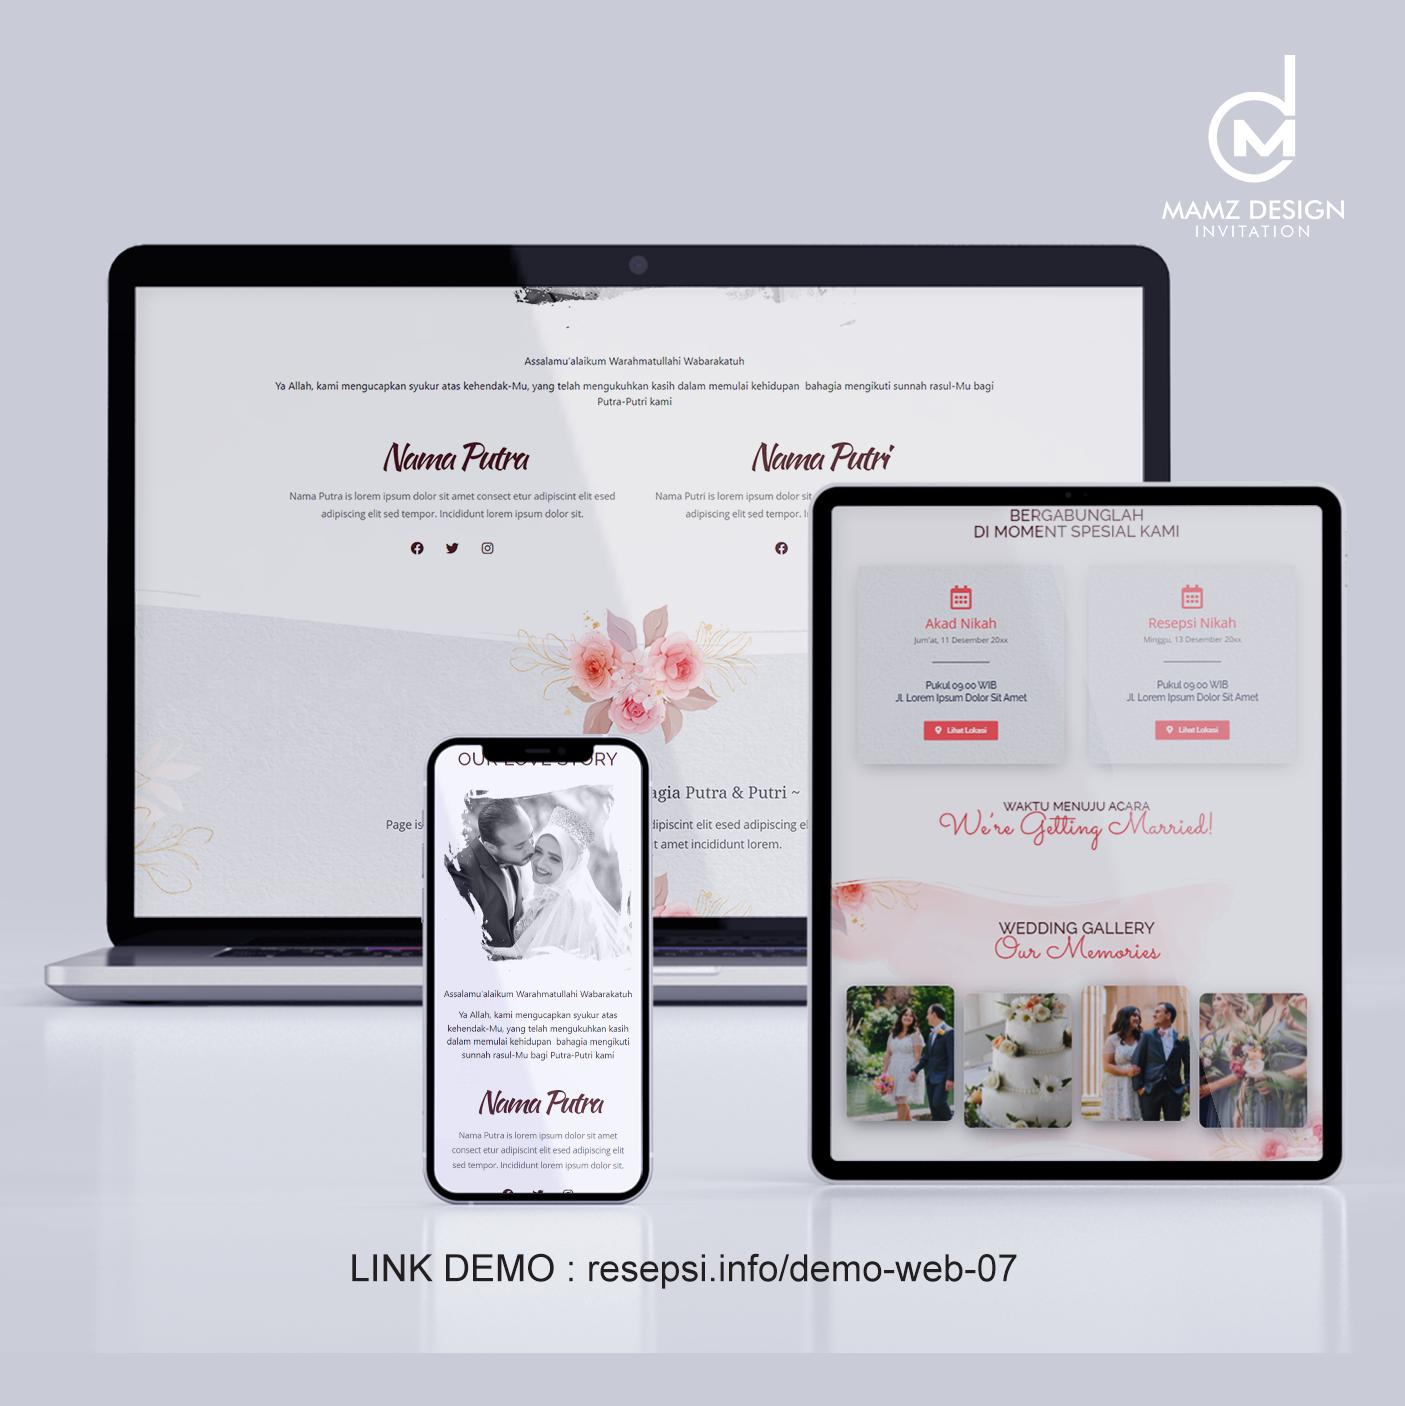 Demo Web 07